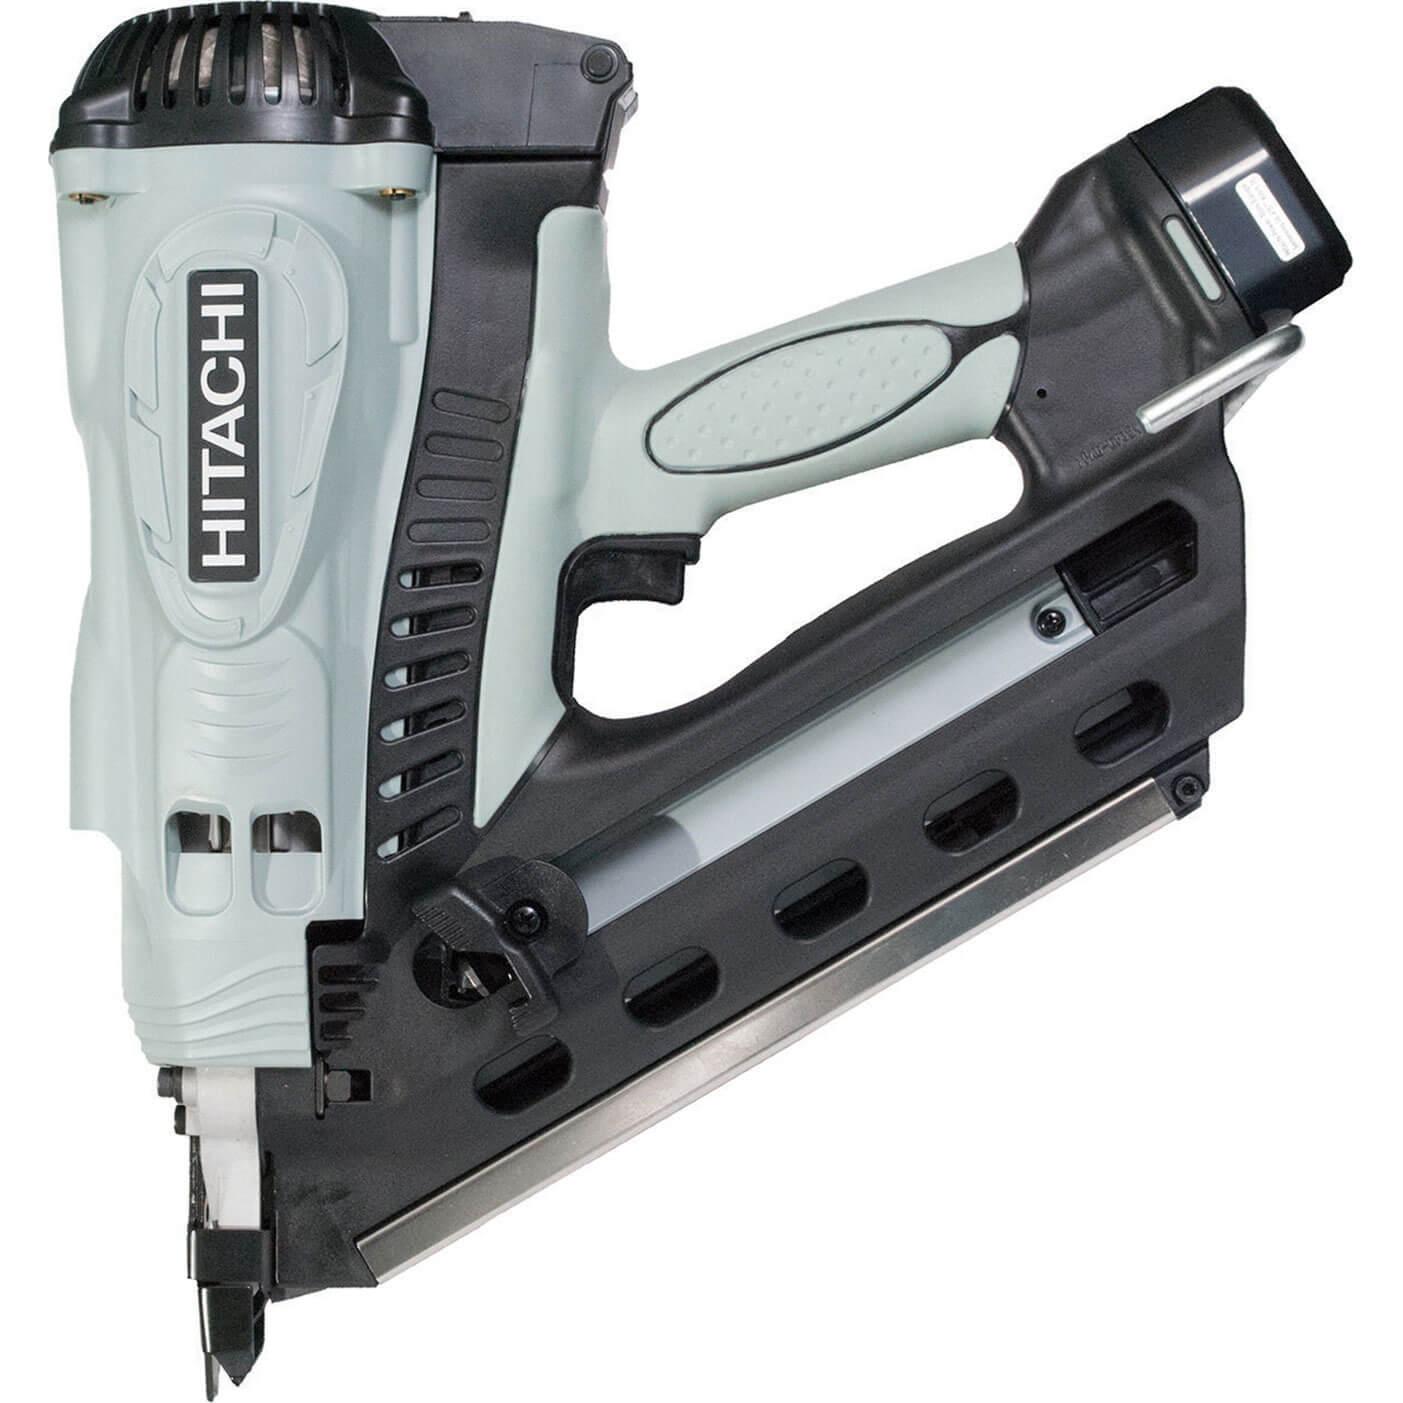 Hitachi Nr90Gc2 Cordless Gas Framing Nail Gun Clipped Head Nails 50 - 90mm with 2 Batteries